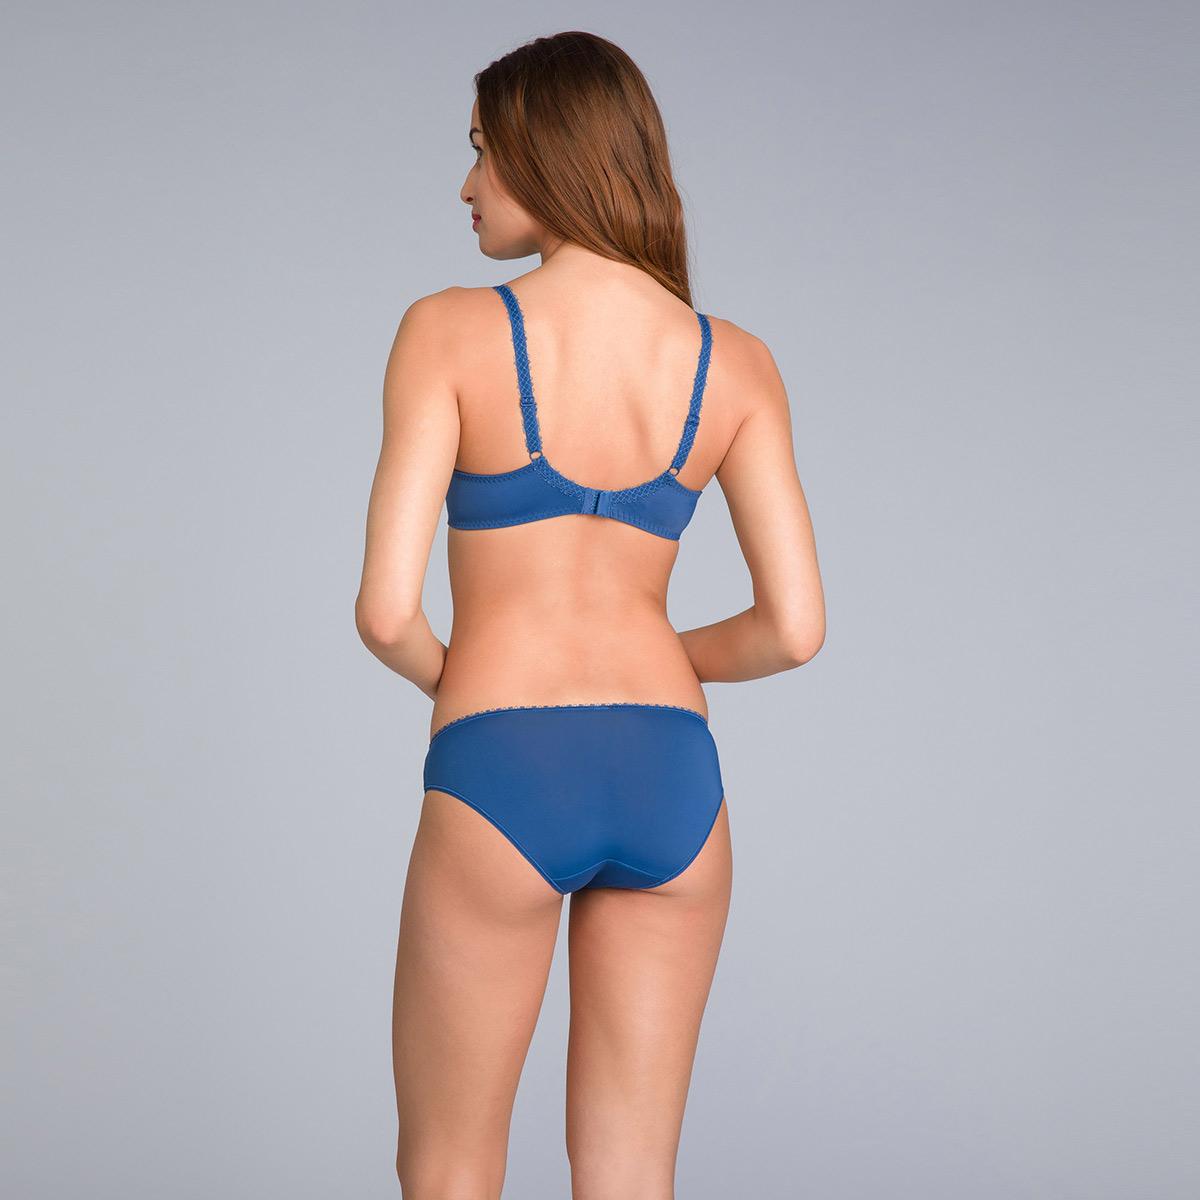 Slip Mini blu navy stampato - Flowery Lace Micro, , PLAYTEX